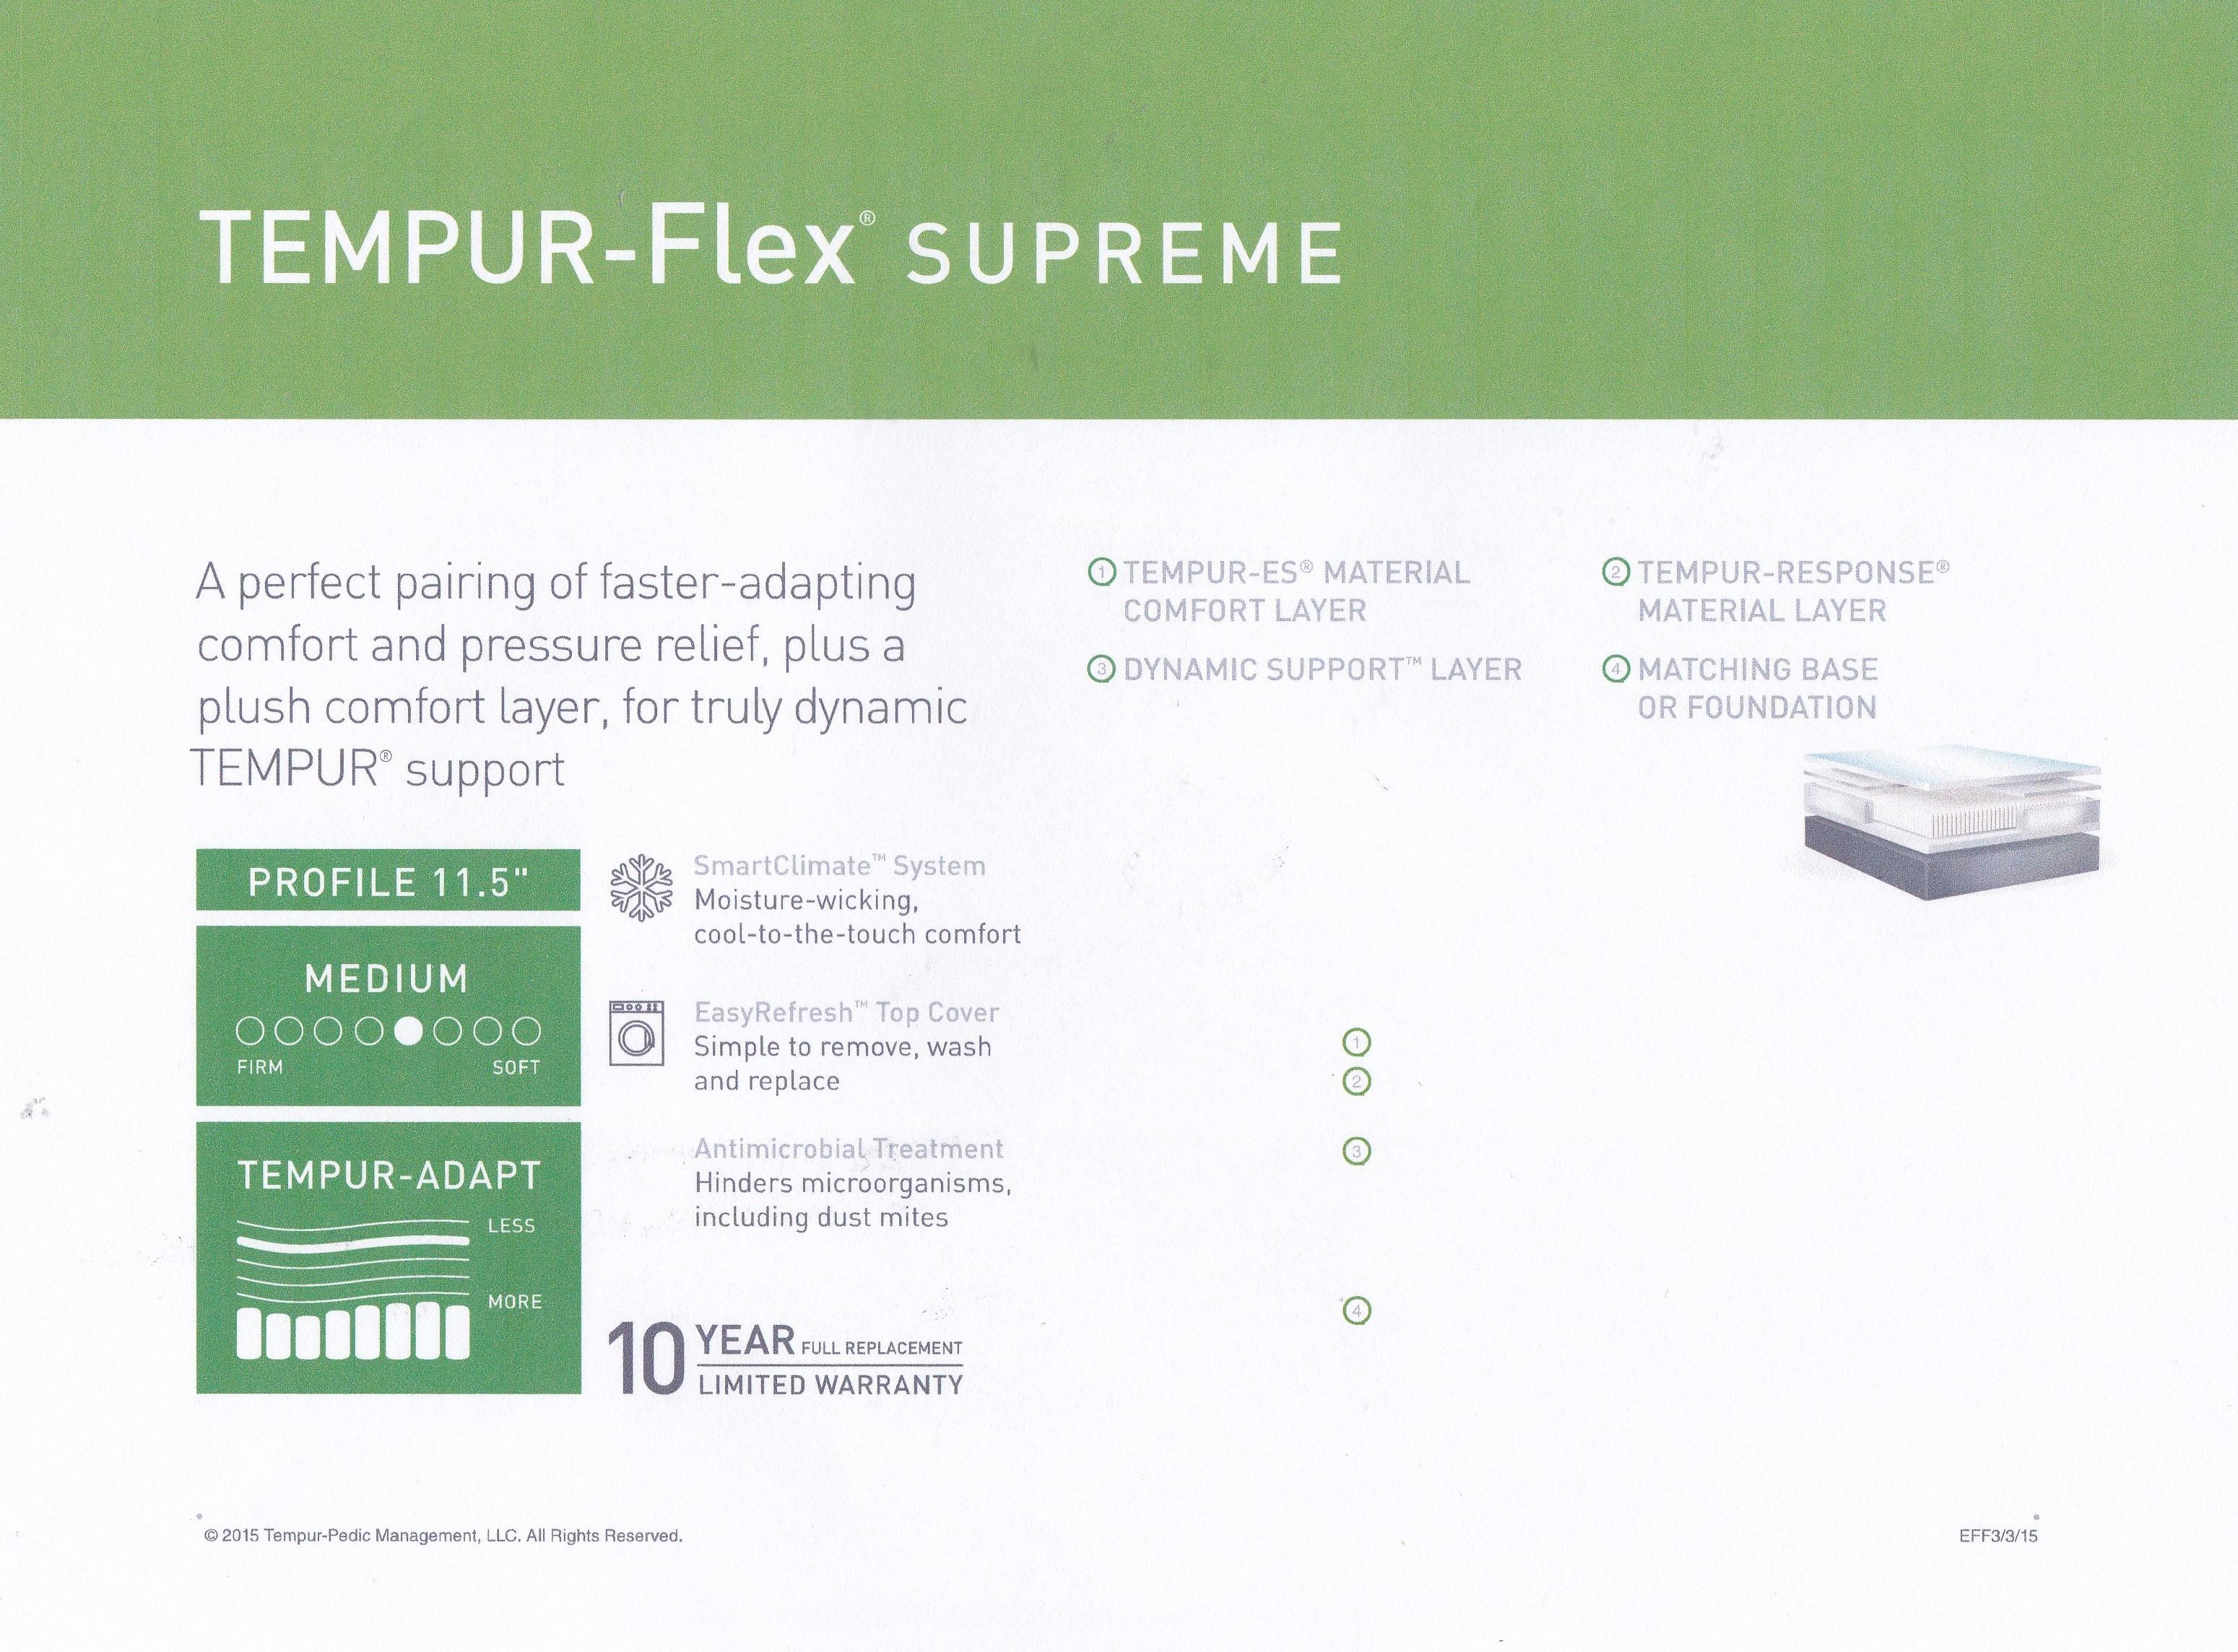 Tempur flex supreme